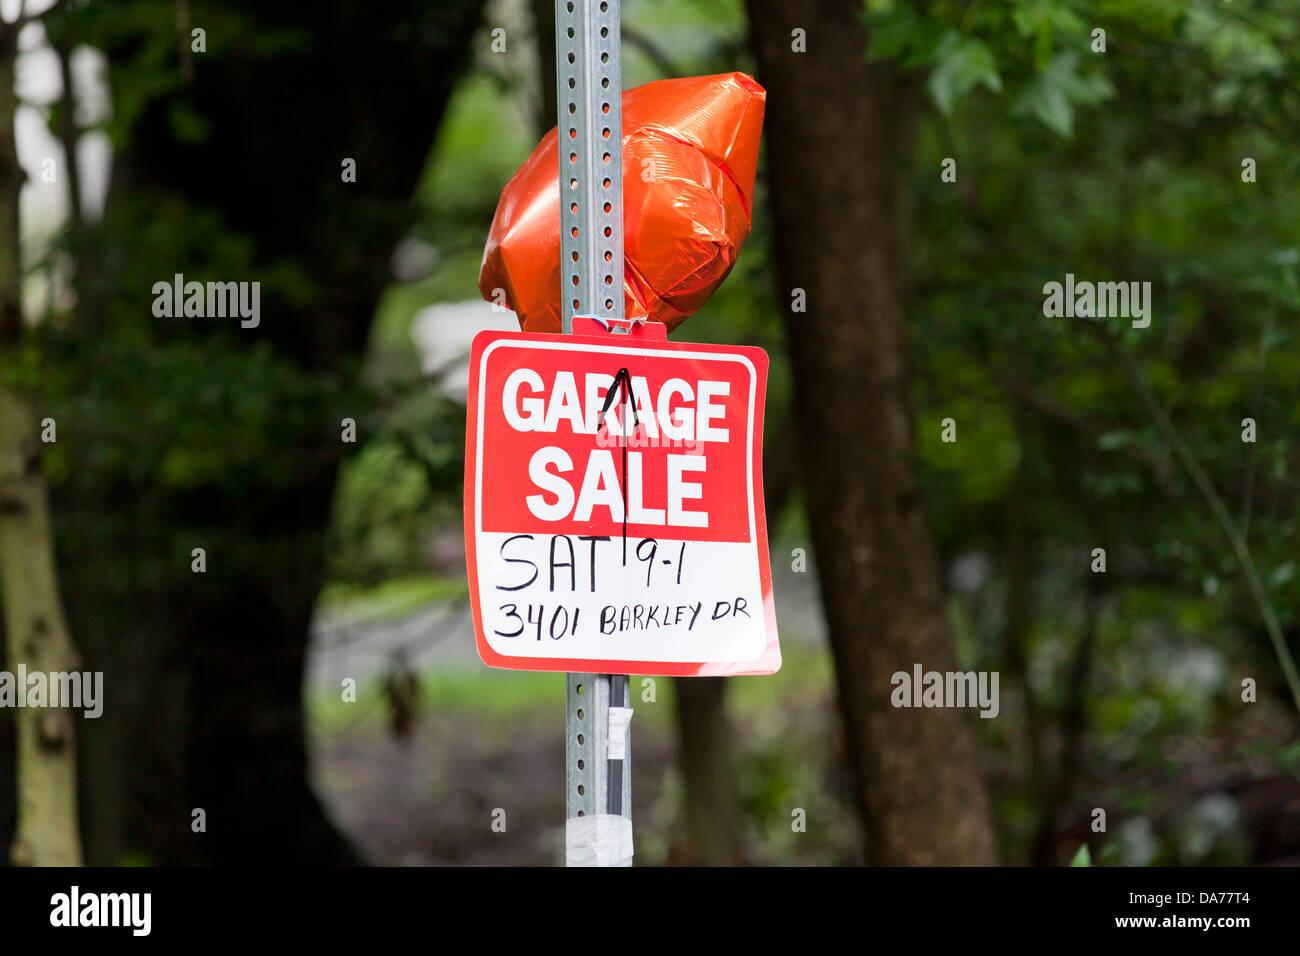 Garage sale sign - Stock Image